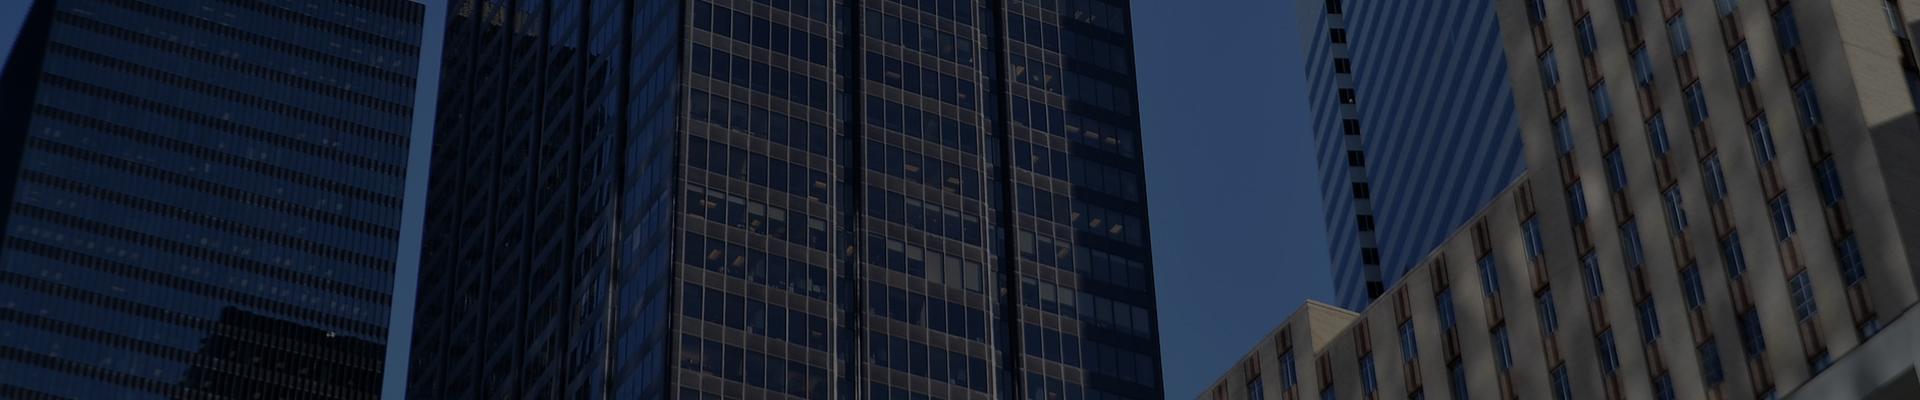 Building & Commercial Services